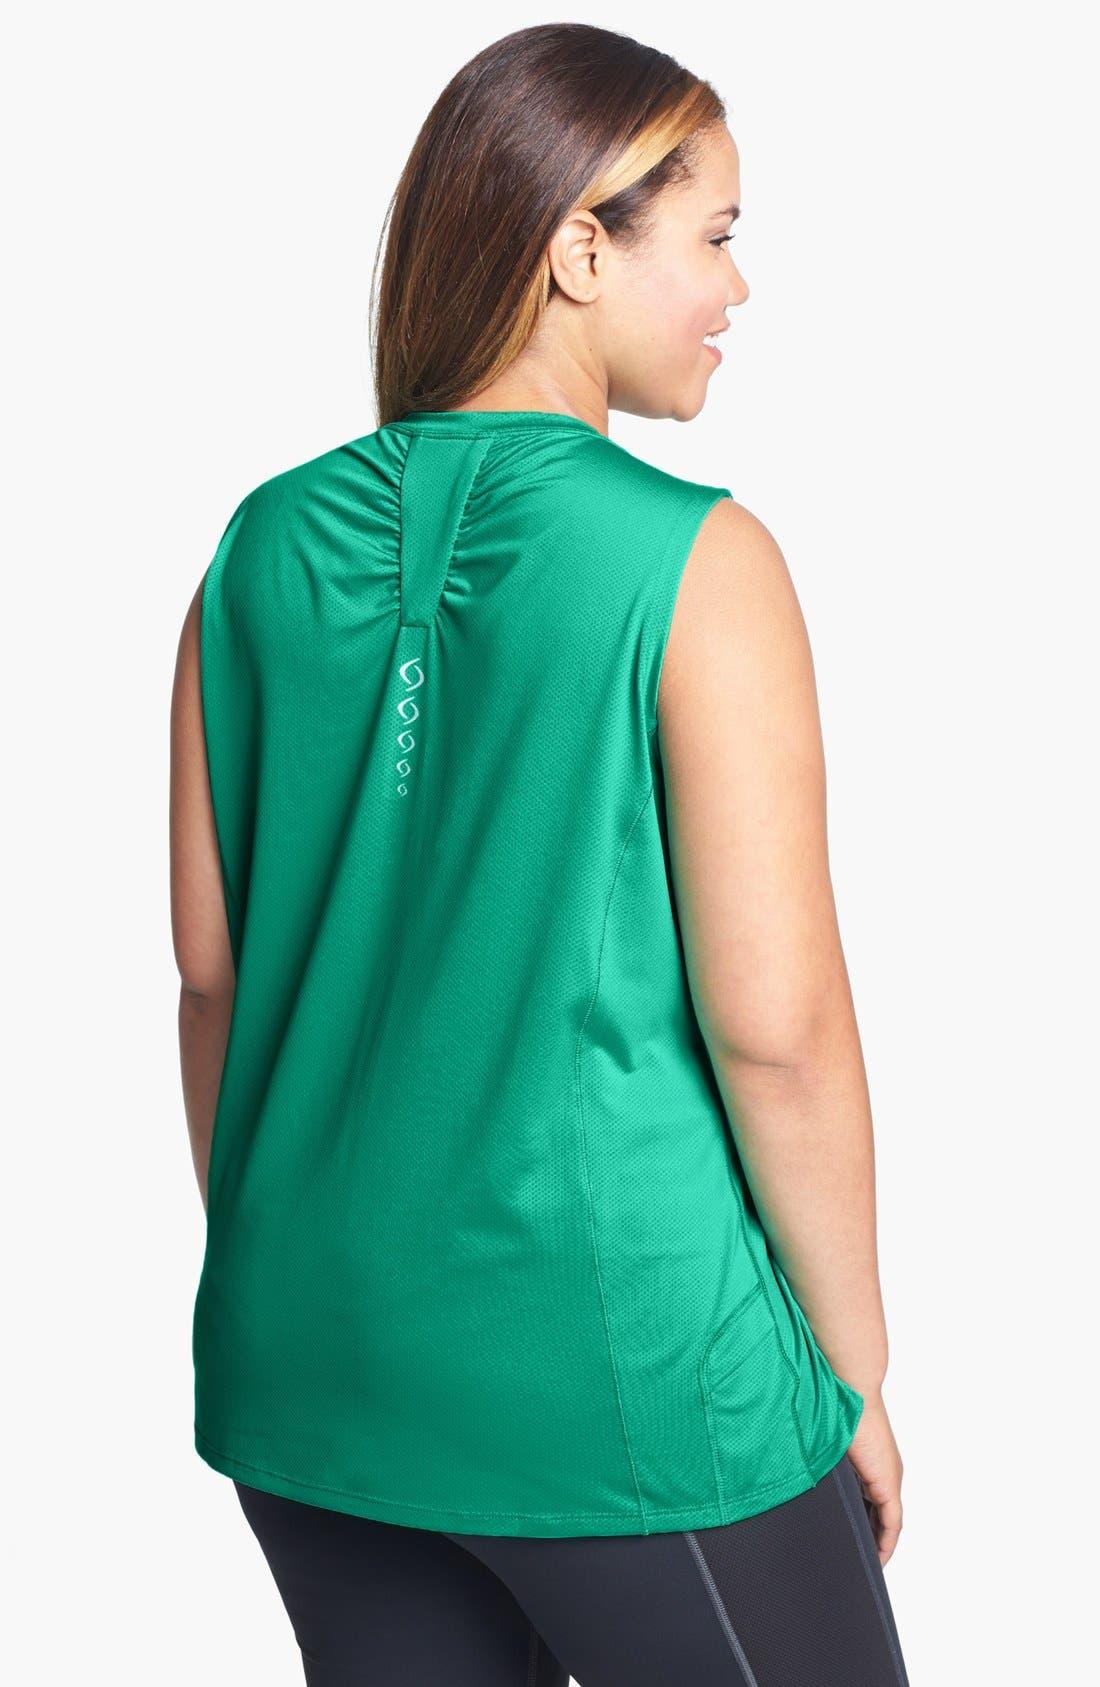 Alternate Image 2  - Moving Comfort 'Sprint' Sleeveless Top (Plus Size)